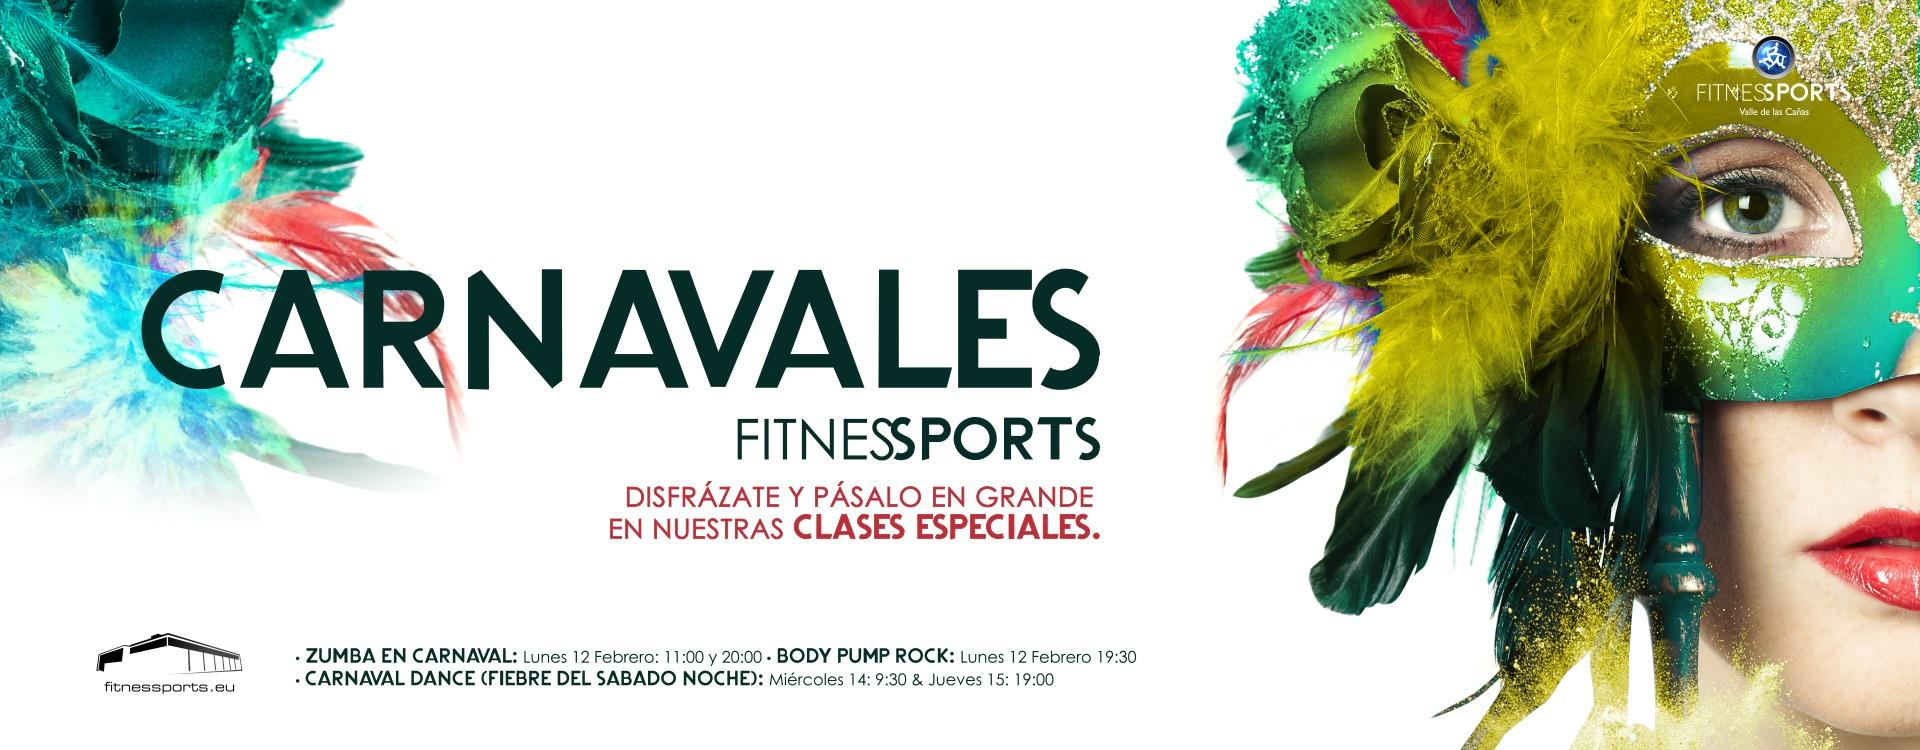 Carnavales Fitness Cartel Perfect Pixel Publicidad Agencia Madrid Banner